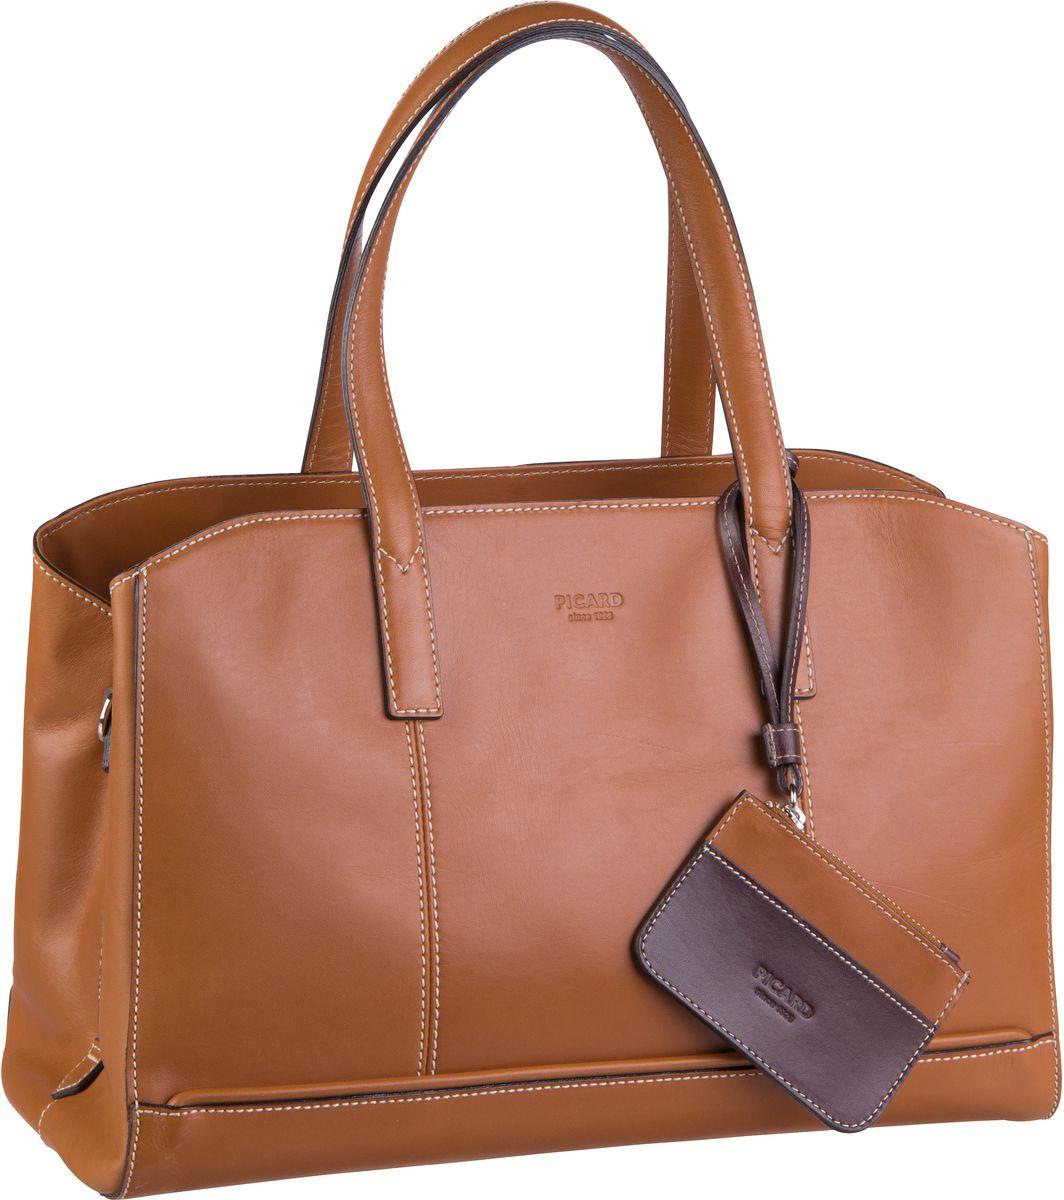 Handtasche Companion 4723 Cognac